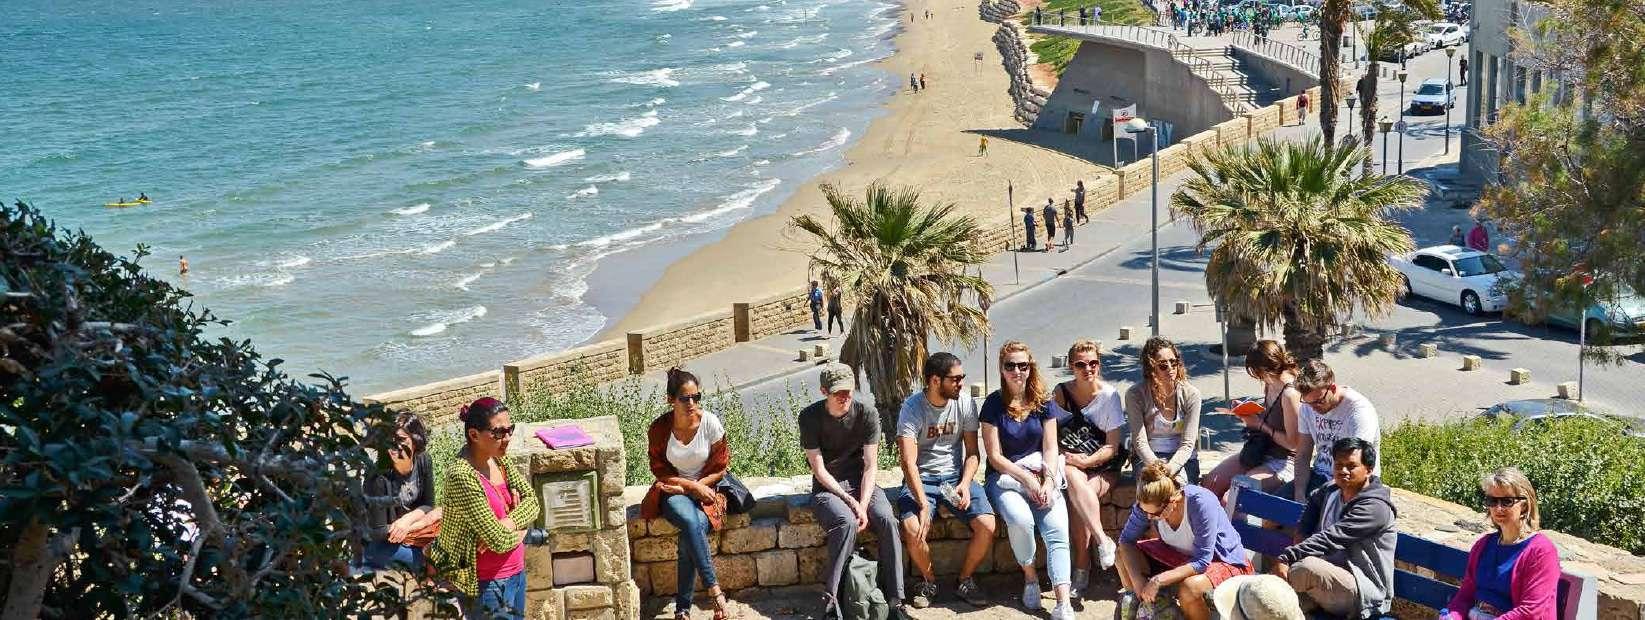 TRAVEL ISRAEL, Travel